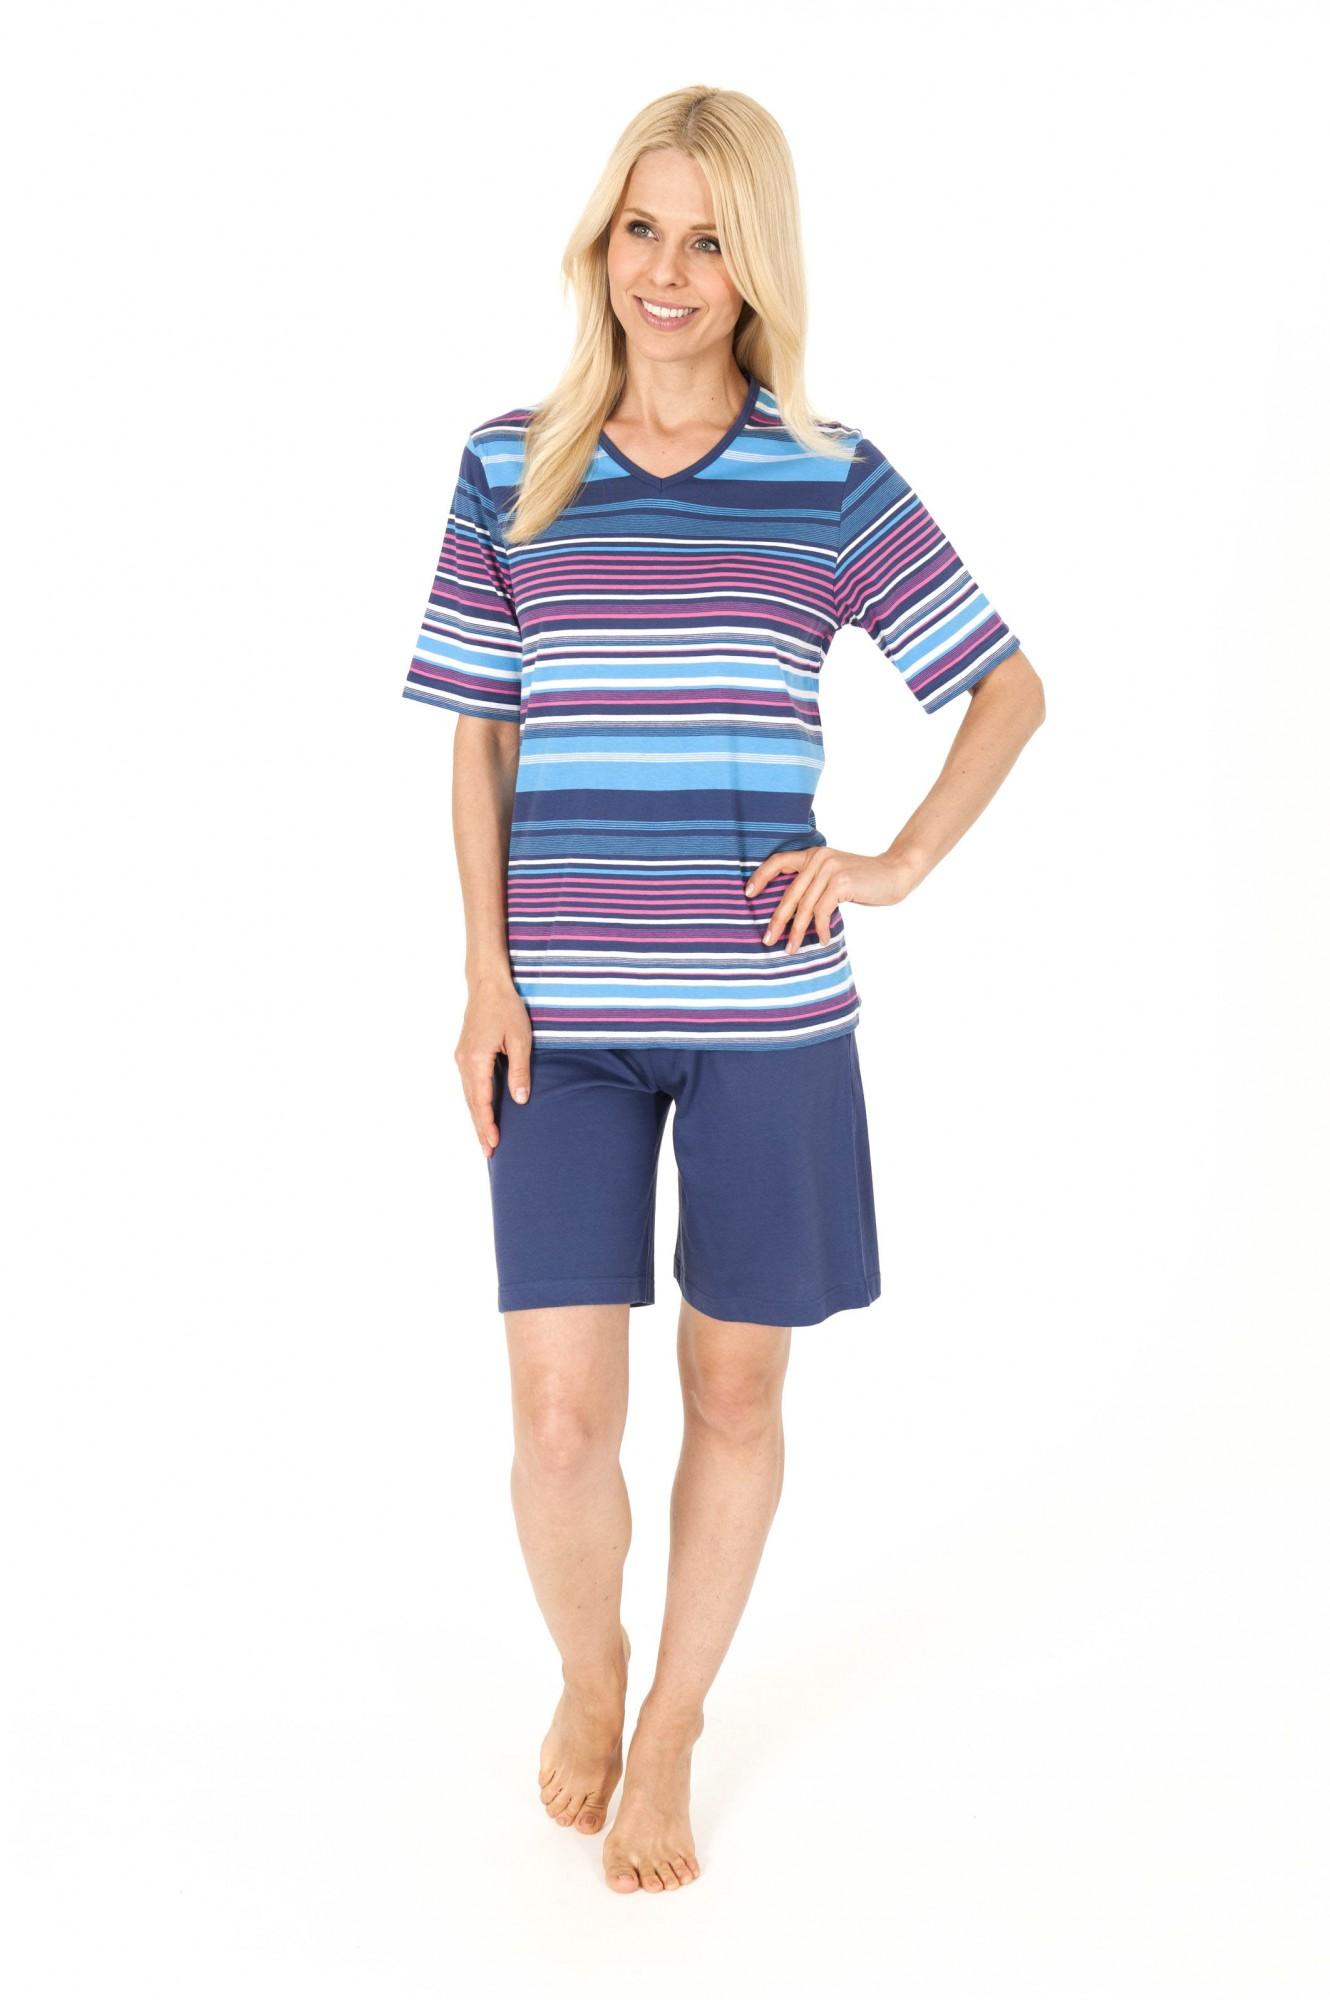 Schicker Damen Shorty Pyjama im Streifenlook – 161 205 90 893